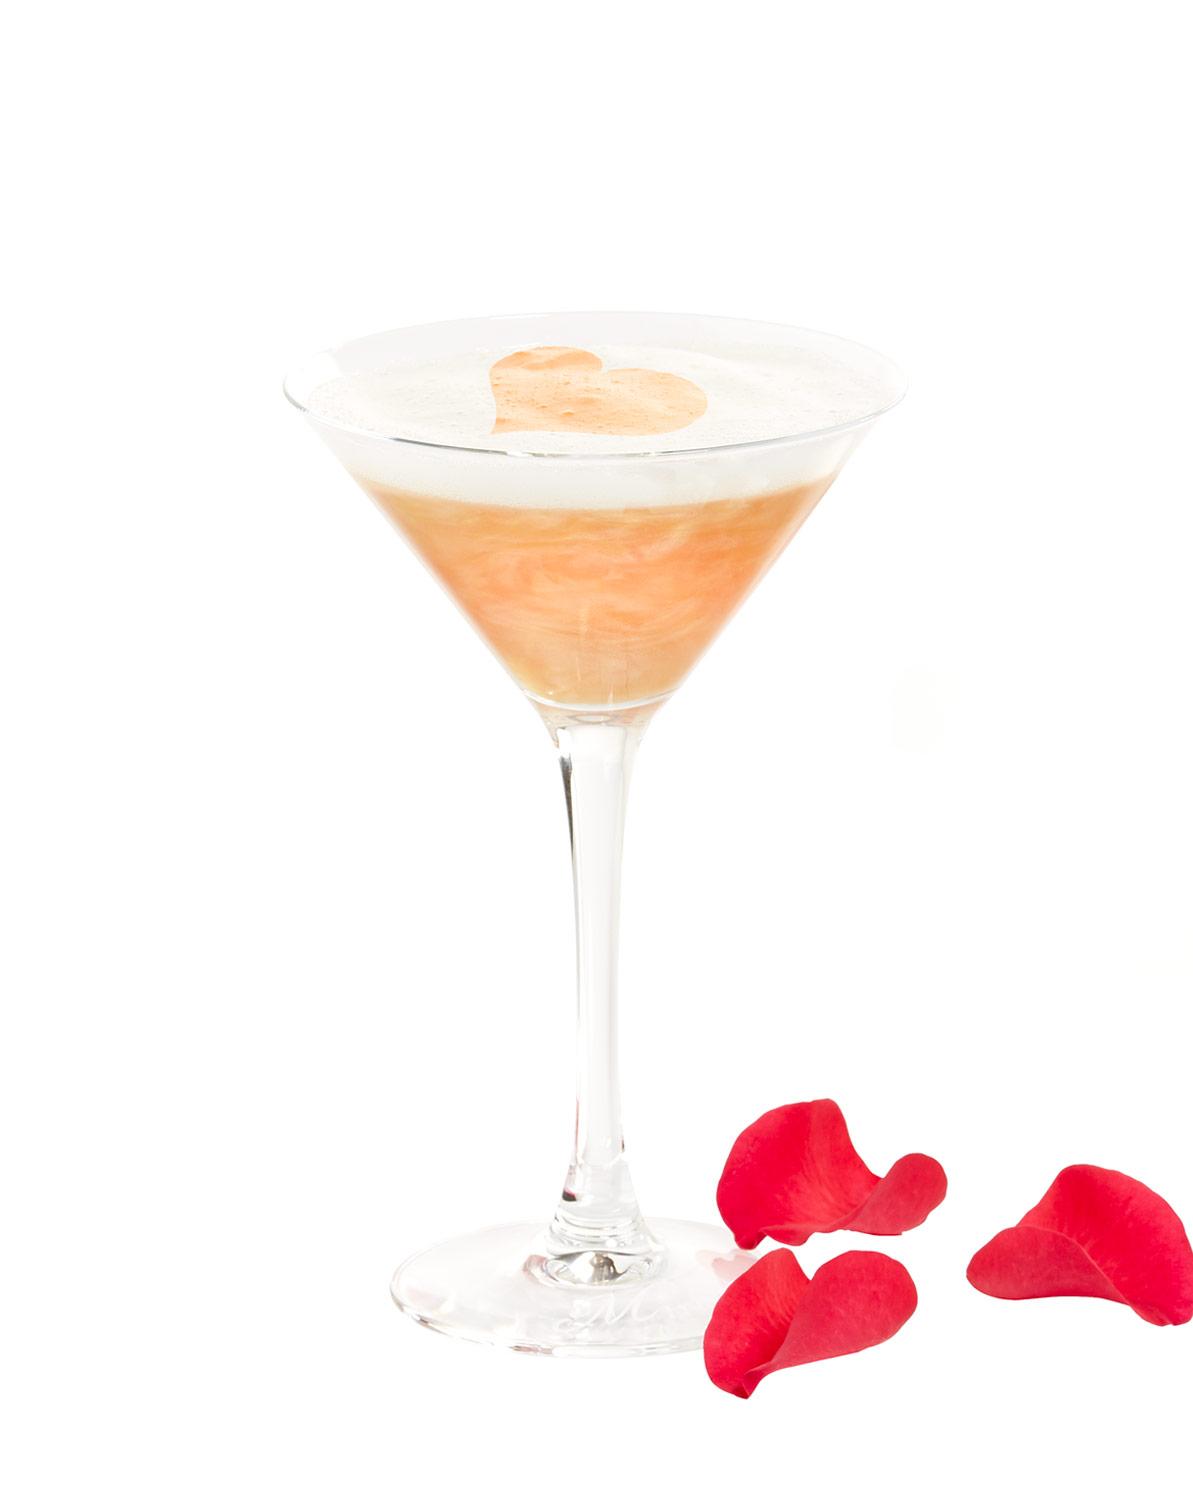 https://www.mirelys.eu/wp-content/uploads/2018/03/cocktail-tropical-hd-08.jpg